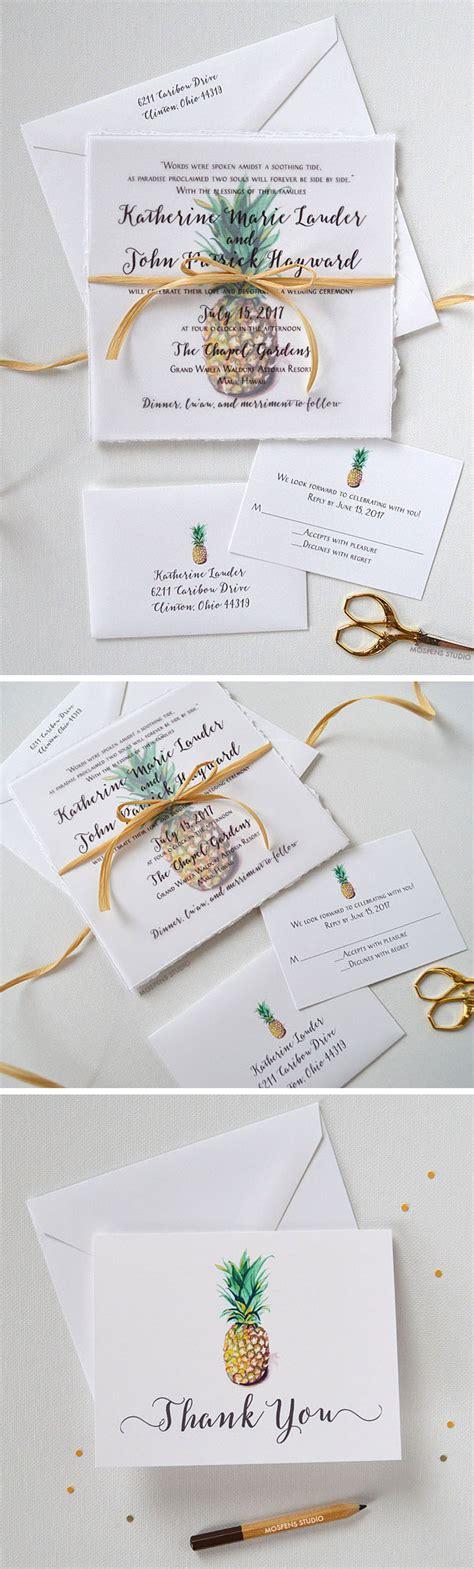 pineapple wedding invitations aloha the pineapple wedding invitation design features